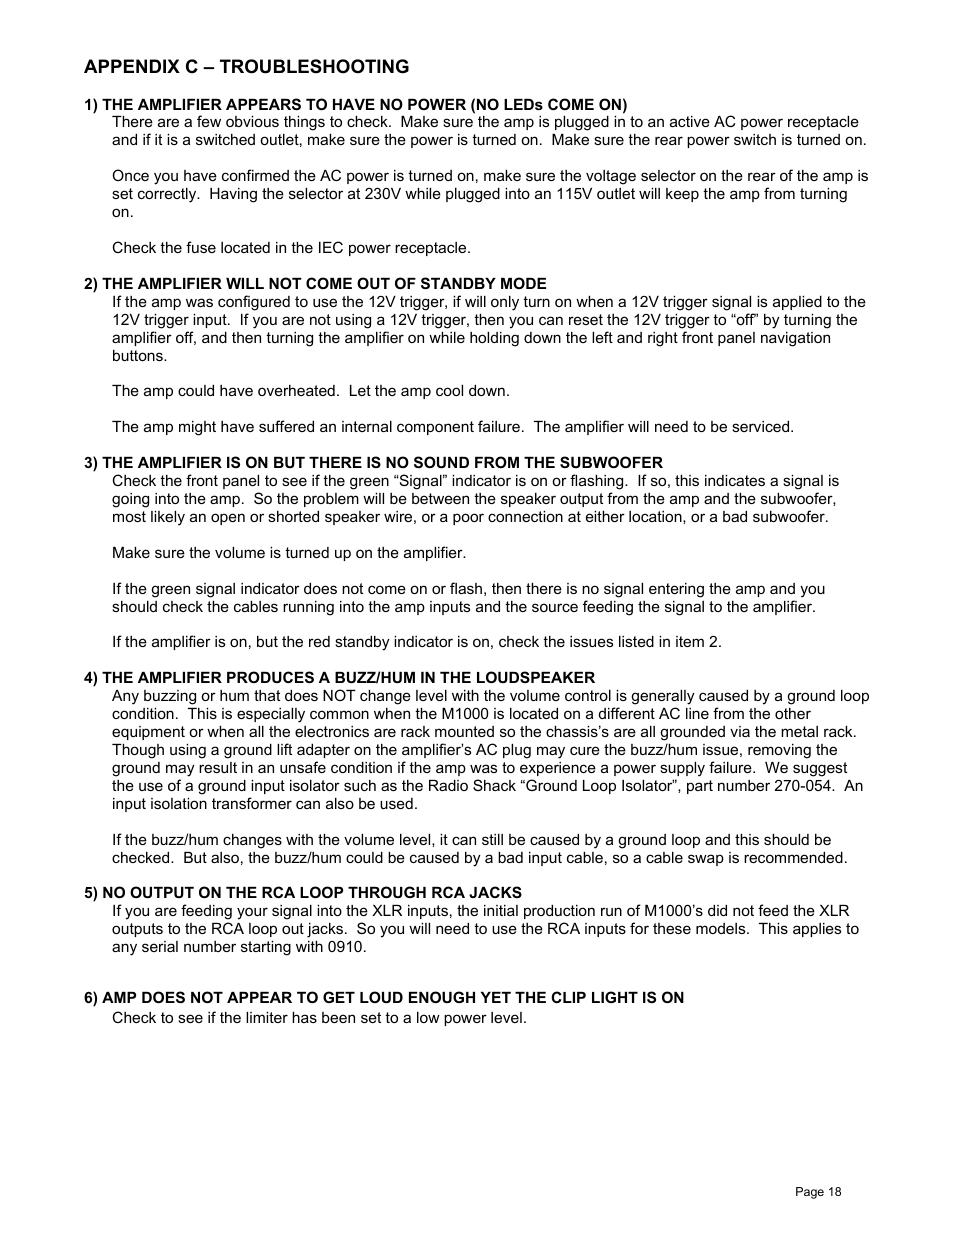 James Loudspeaker M1000 User Manual | Page 18 / 19